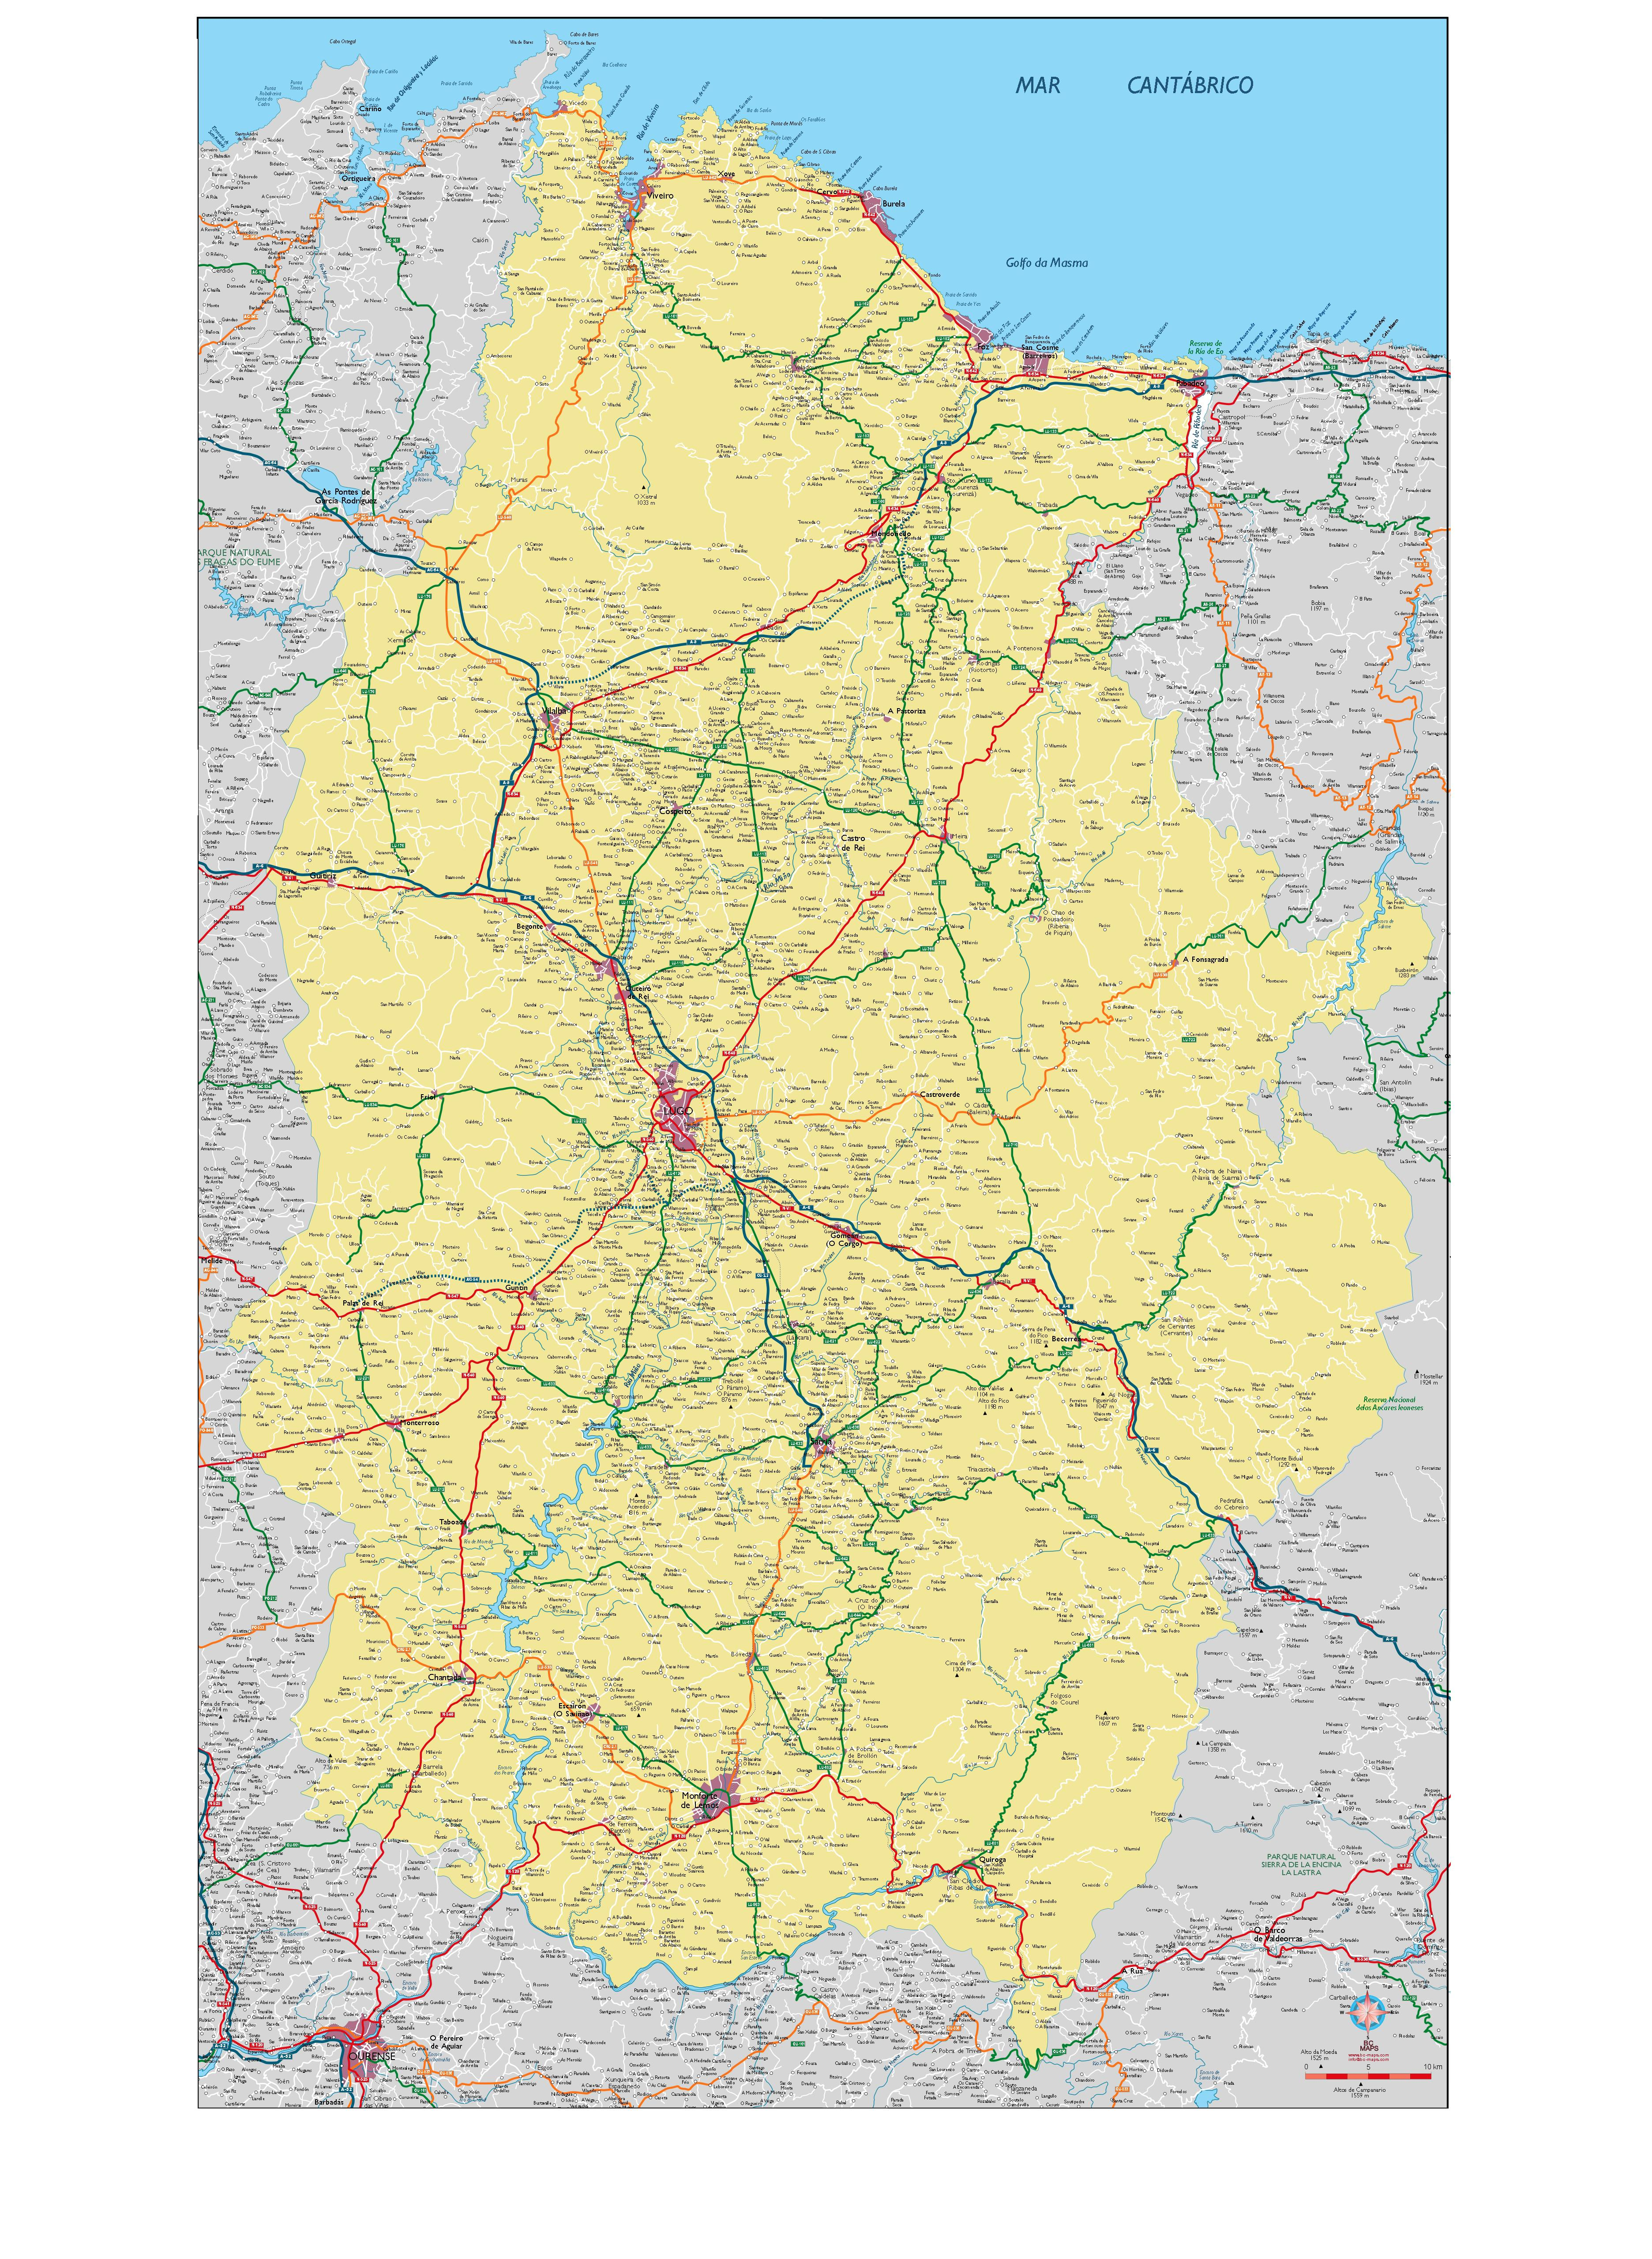 Lugo Mapa Vectorial Illustrator Eps Provincia 200 Bc Maps Mapa